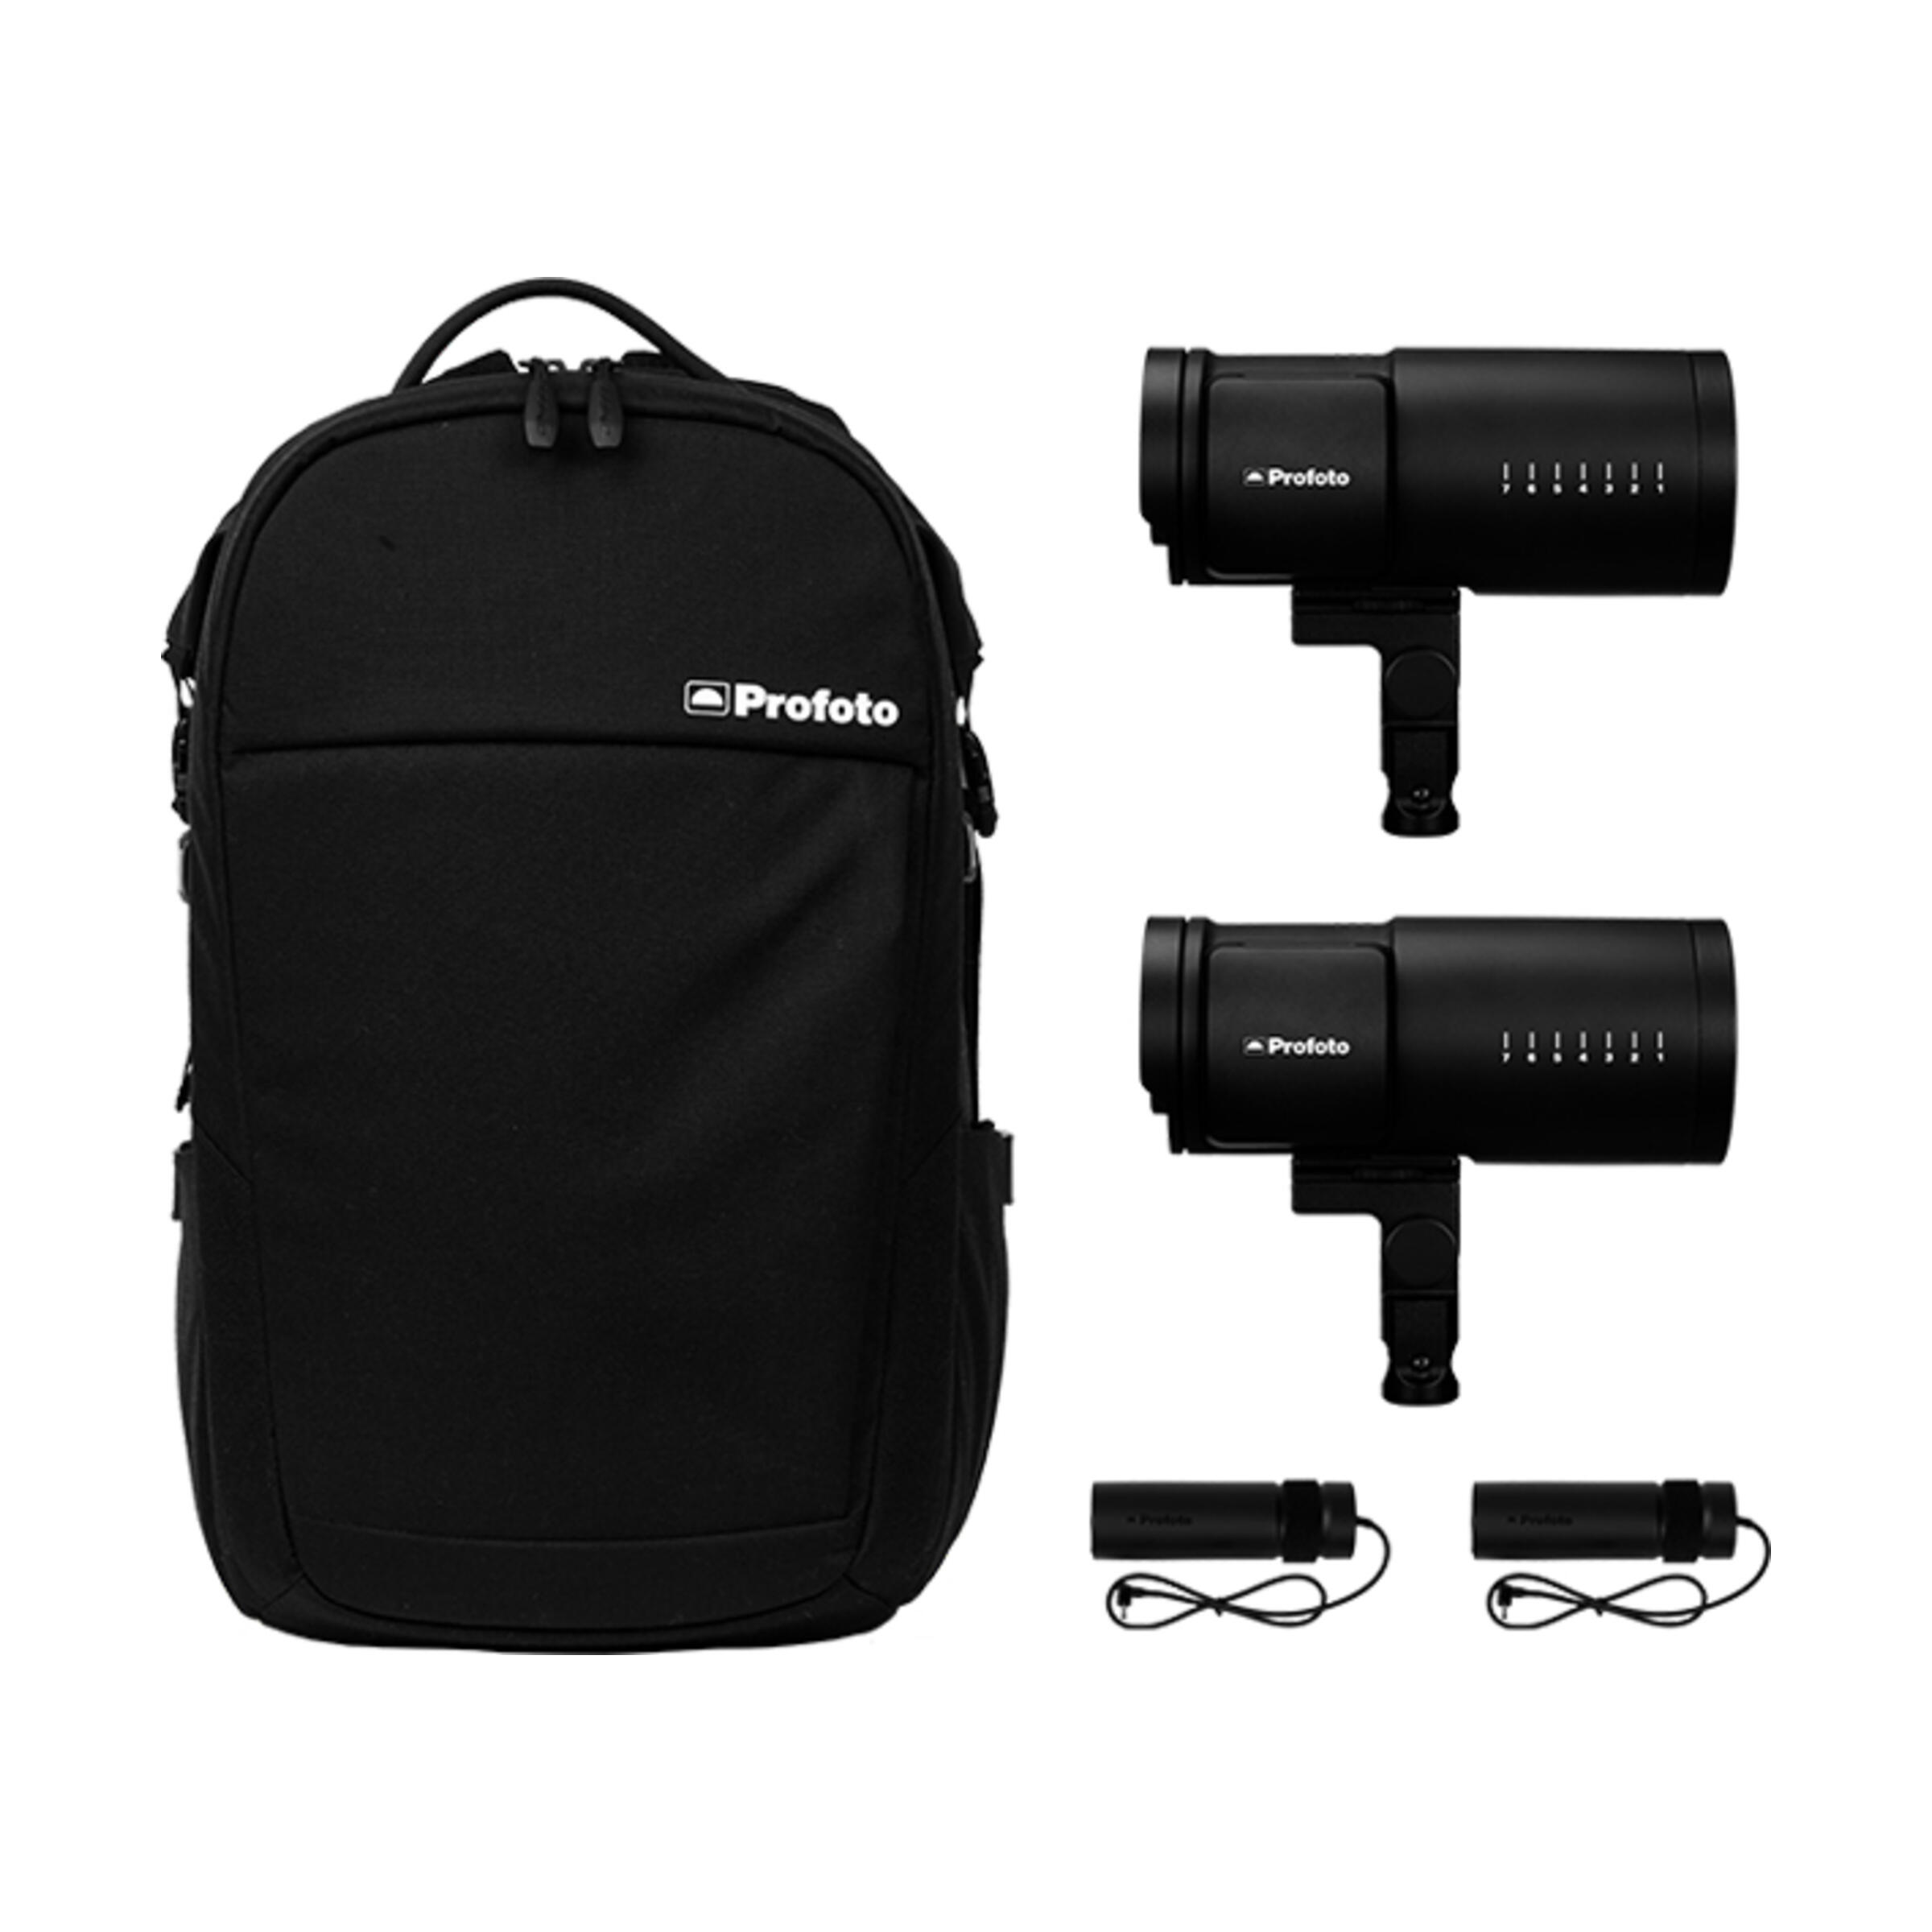 Profoto B10 Plus AirTTL Duo Kit